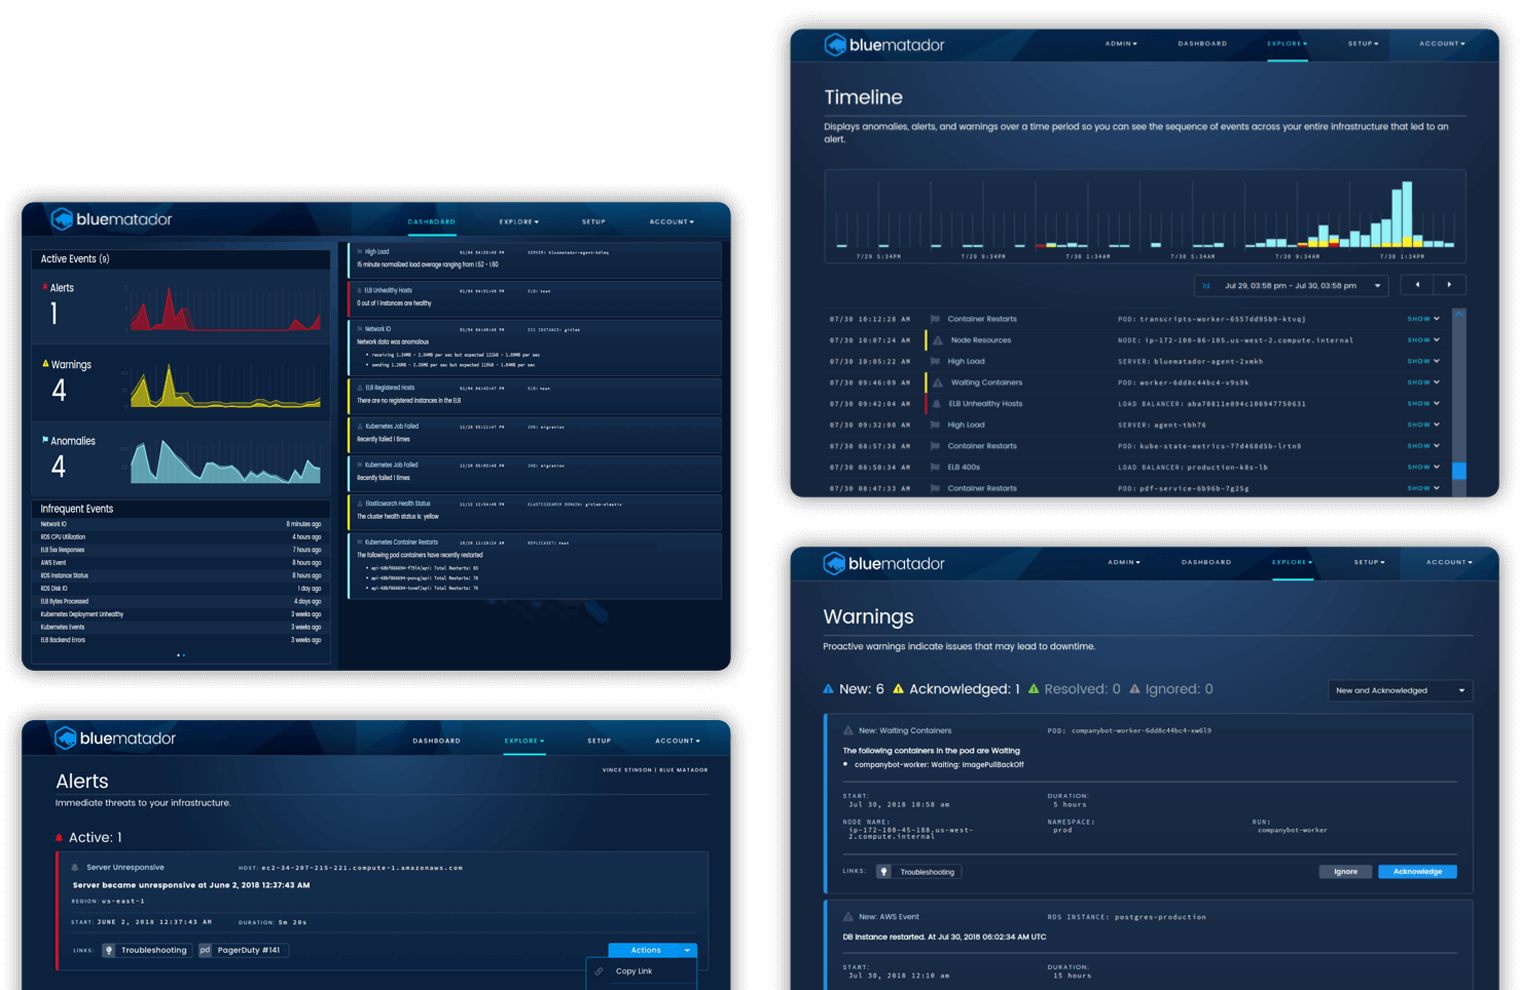 Blue Matador has multiple dashboards for proactive monitoring